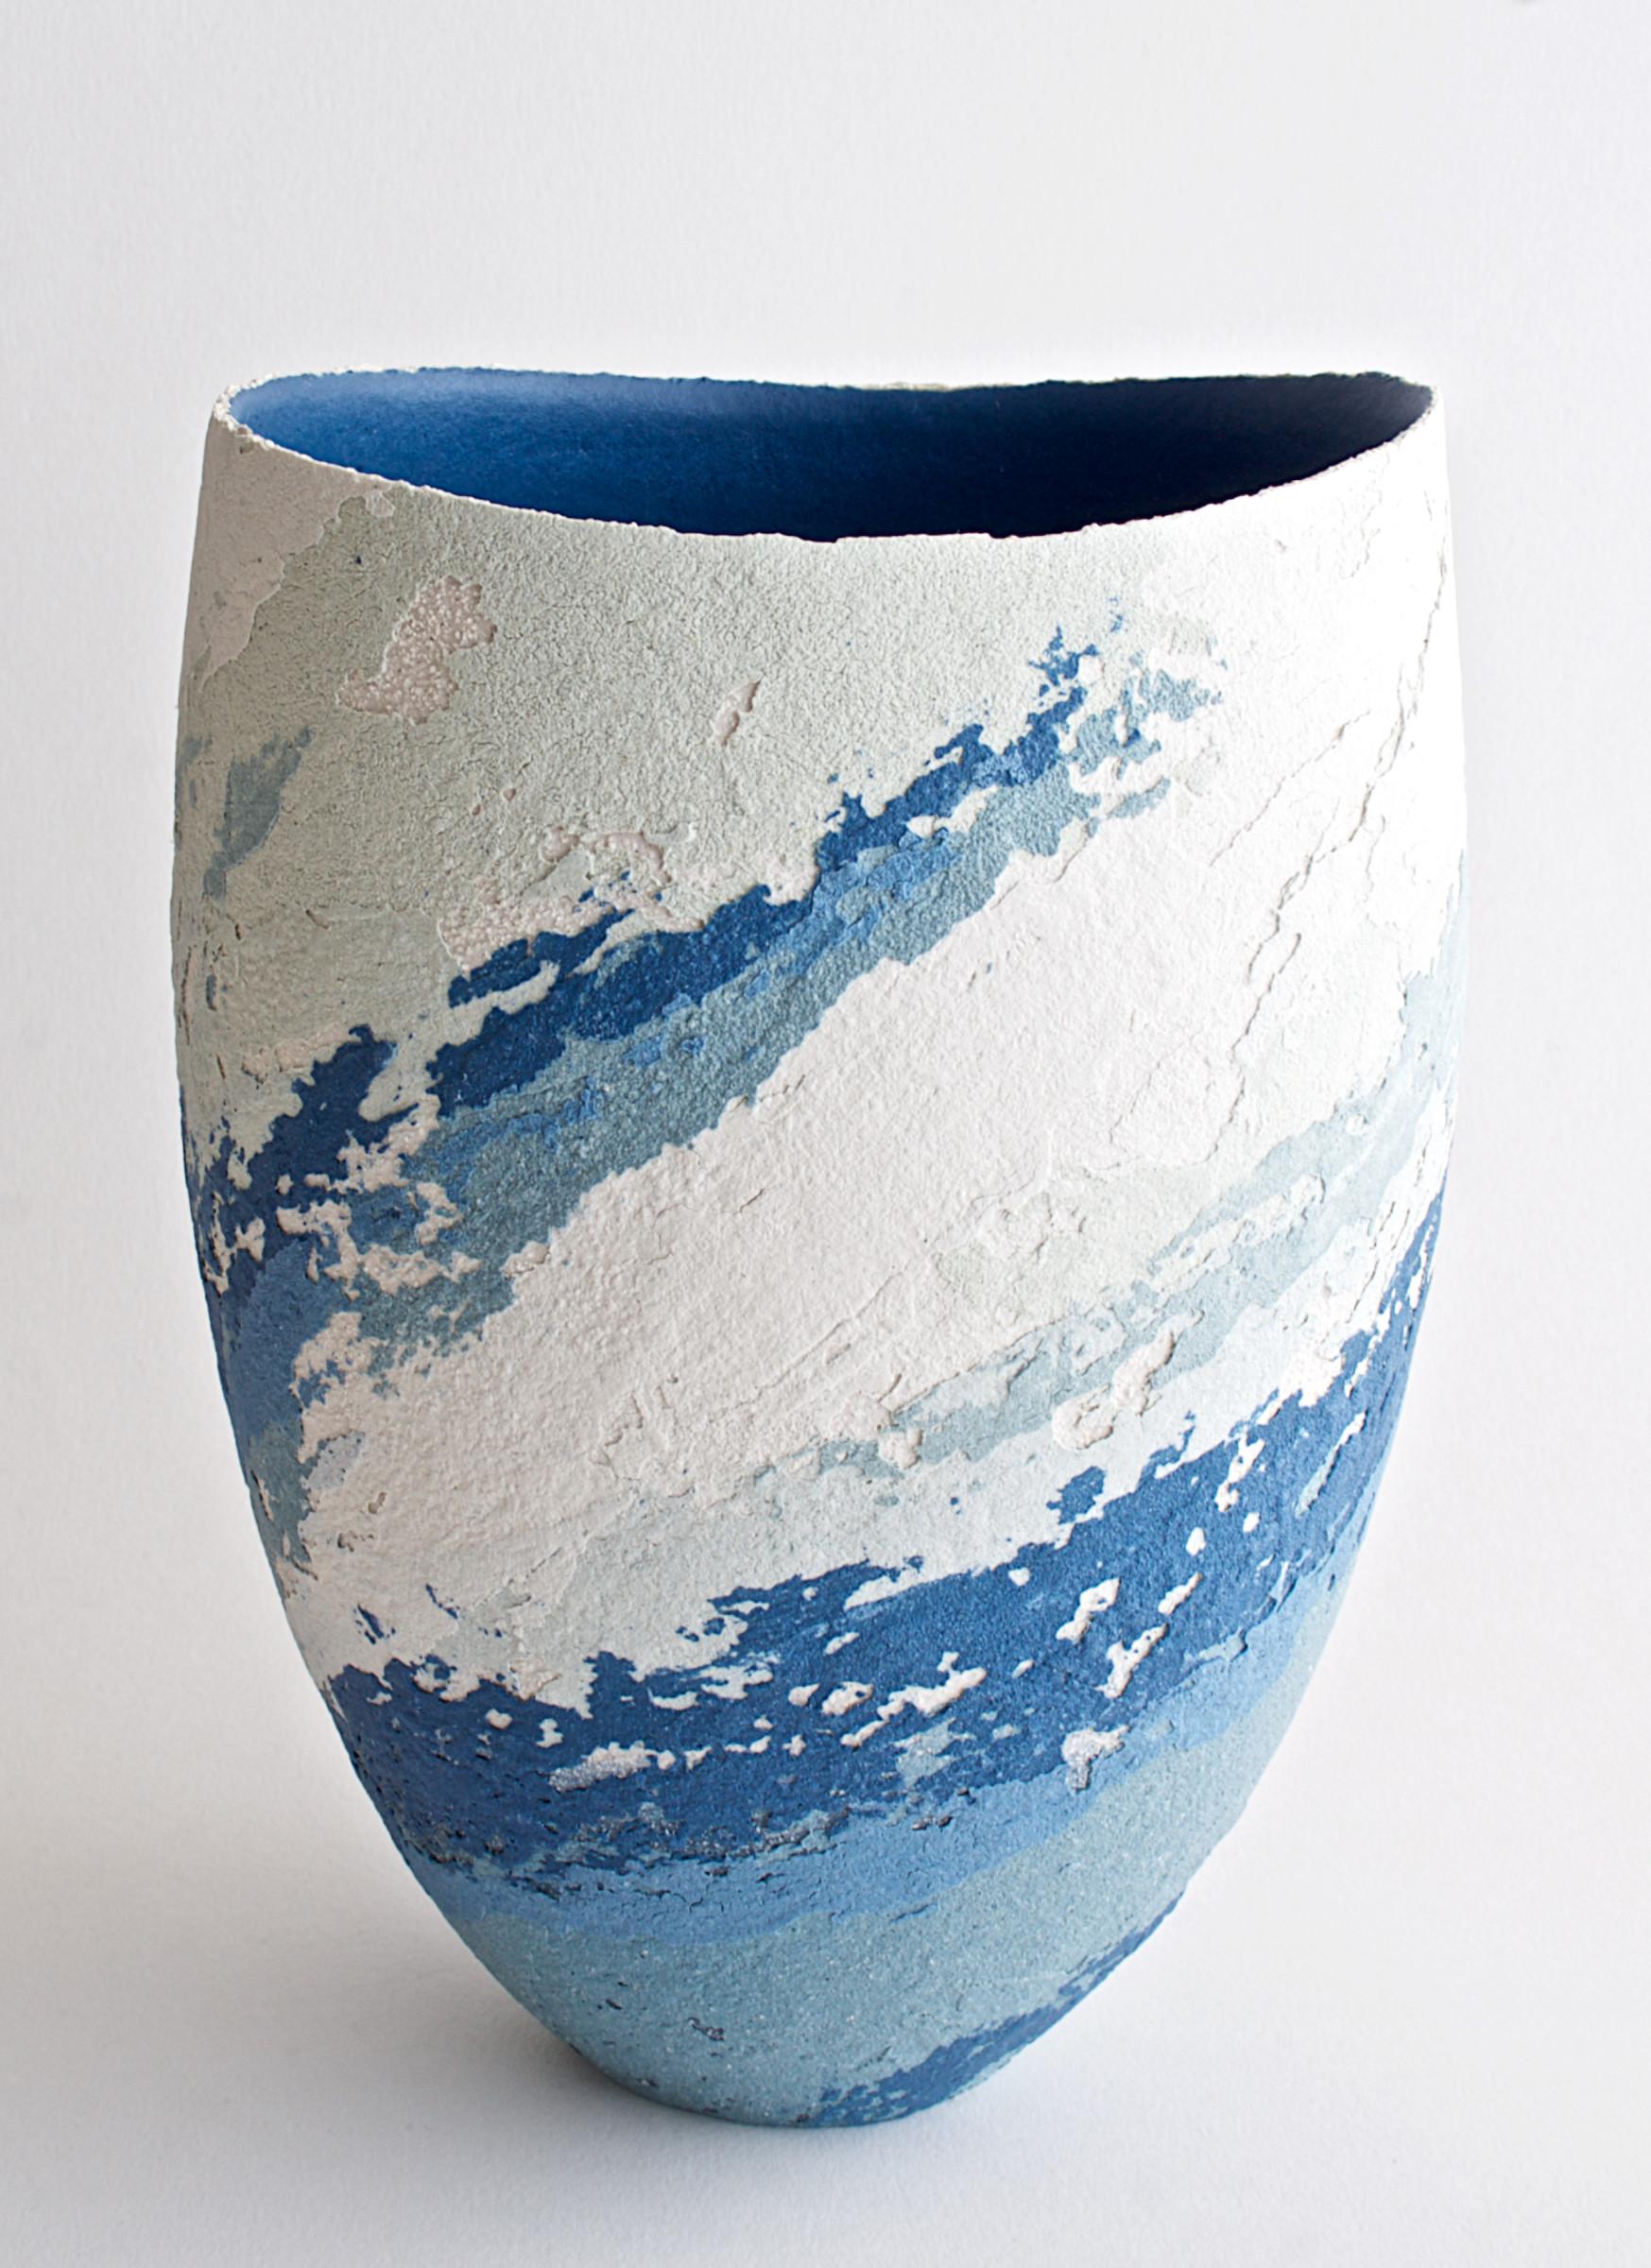 "<span class=""link fancybox-details-link""><a href=""/artists/79-clare-conrad/works/6934-clare-conrad-vessel-scooped-rim-2020/"">View Detail Page</a></span><div class=""artist""><strong>Clare Conrad</strong></div> <div class=""title""><em>Vessel, scooped rim</em>, 2020</div> <div class=""medium"">Stoneware</div> <div class=""dimensions"">h. 21.5 cm</div><div class=""copyright_line"">Copyright The Artist</div>"